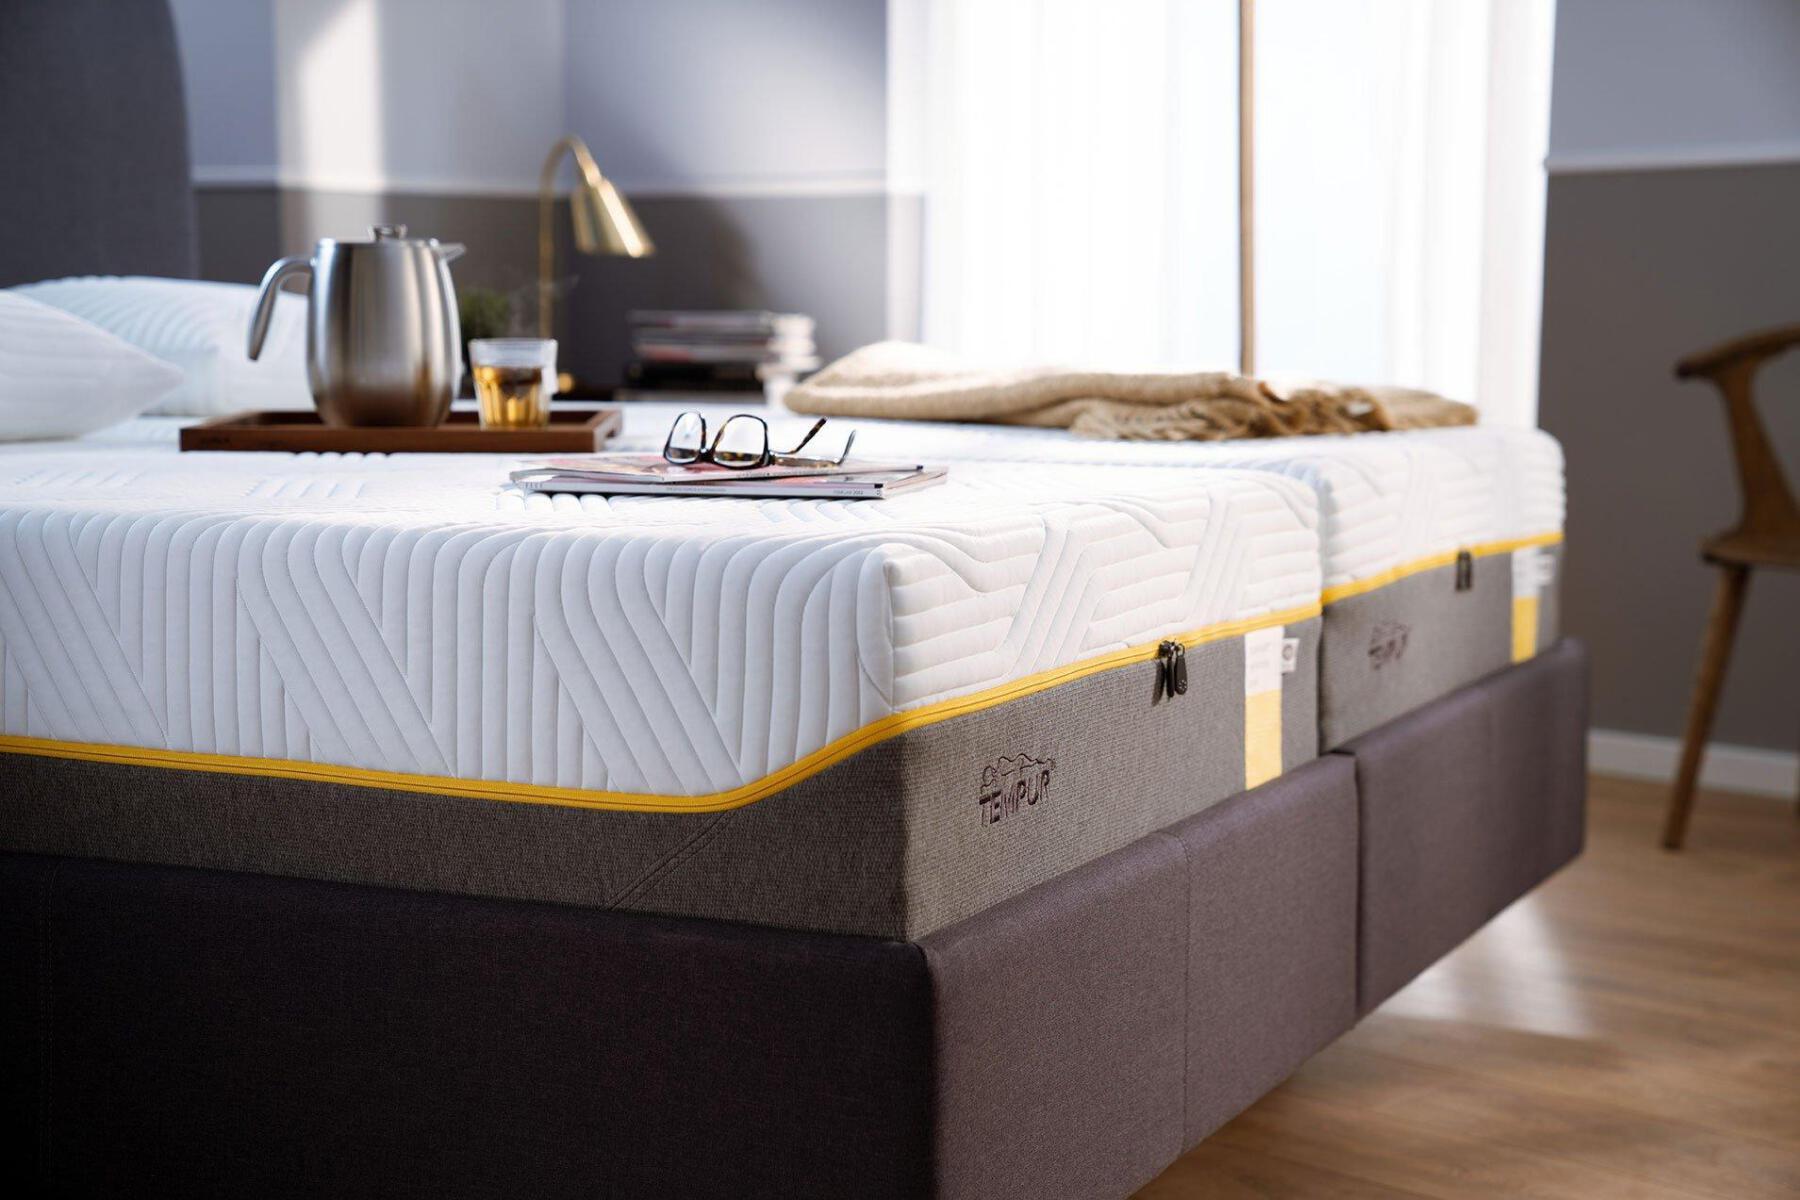 tempur sensation matras gasse slaapcomfort 6